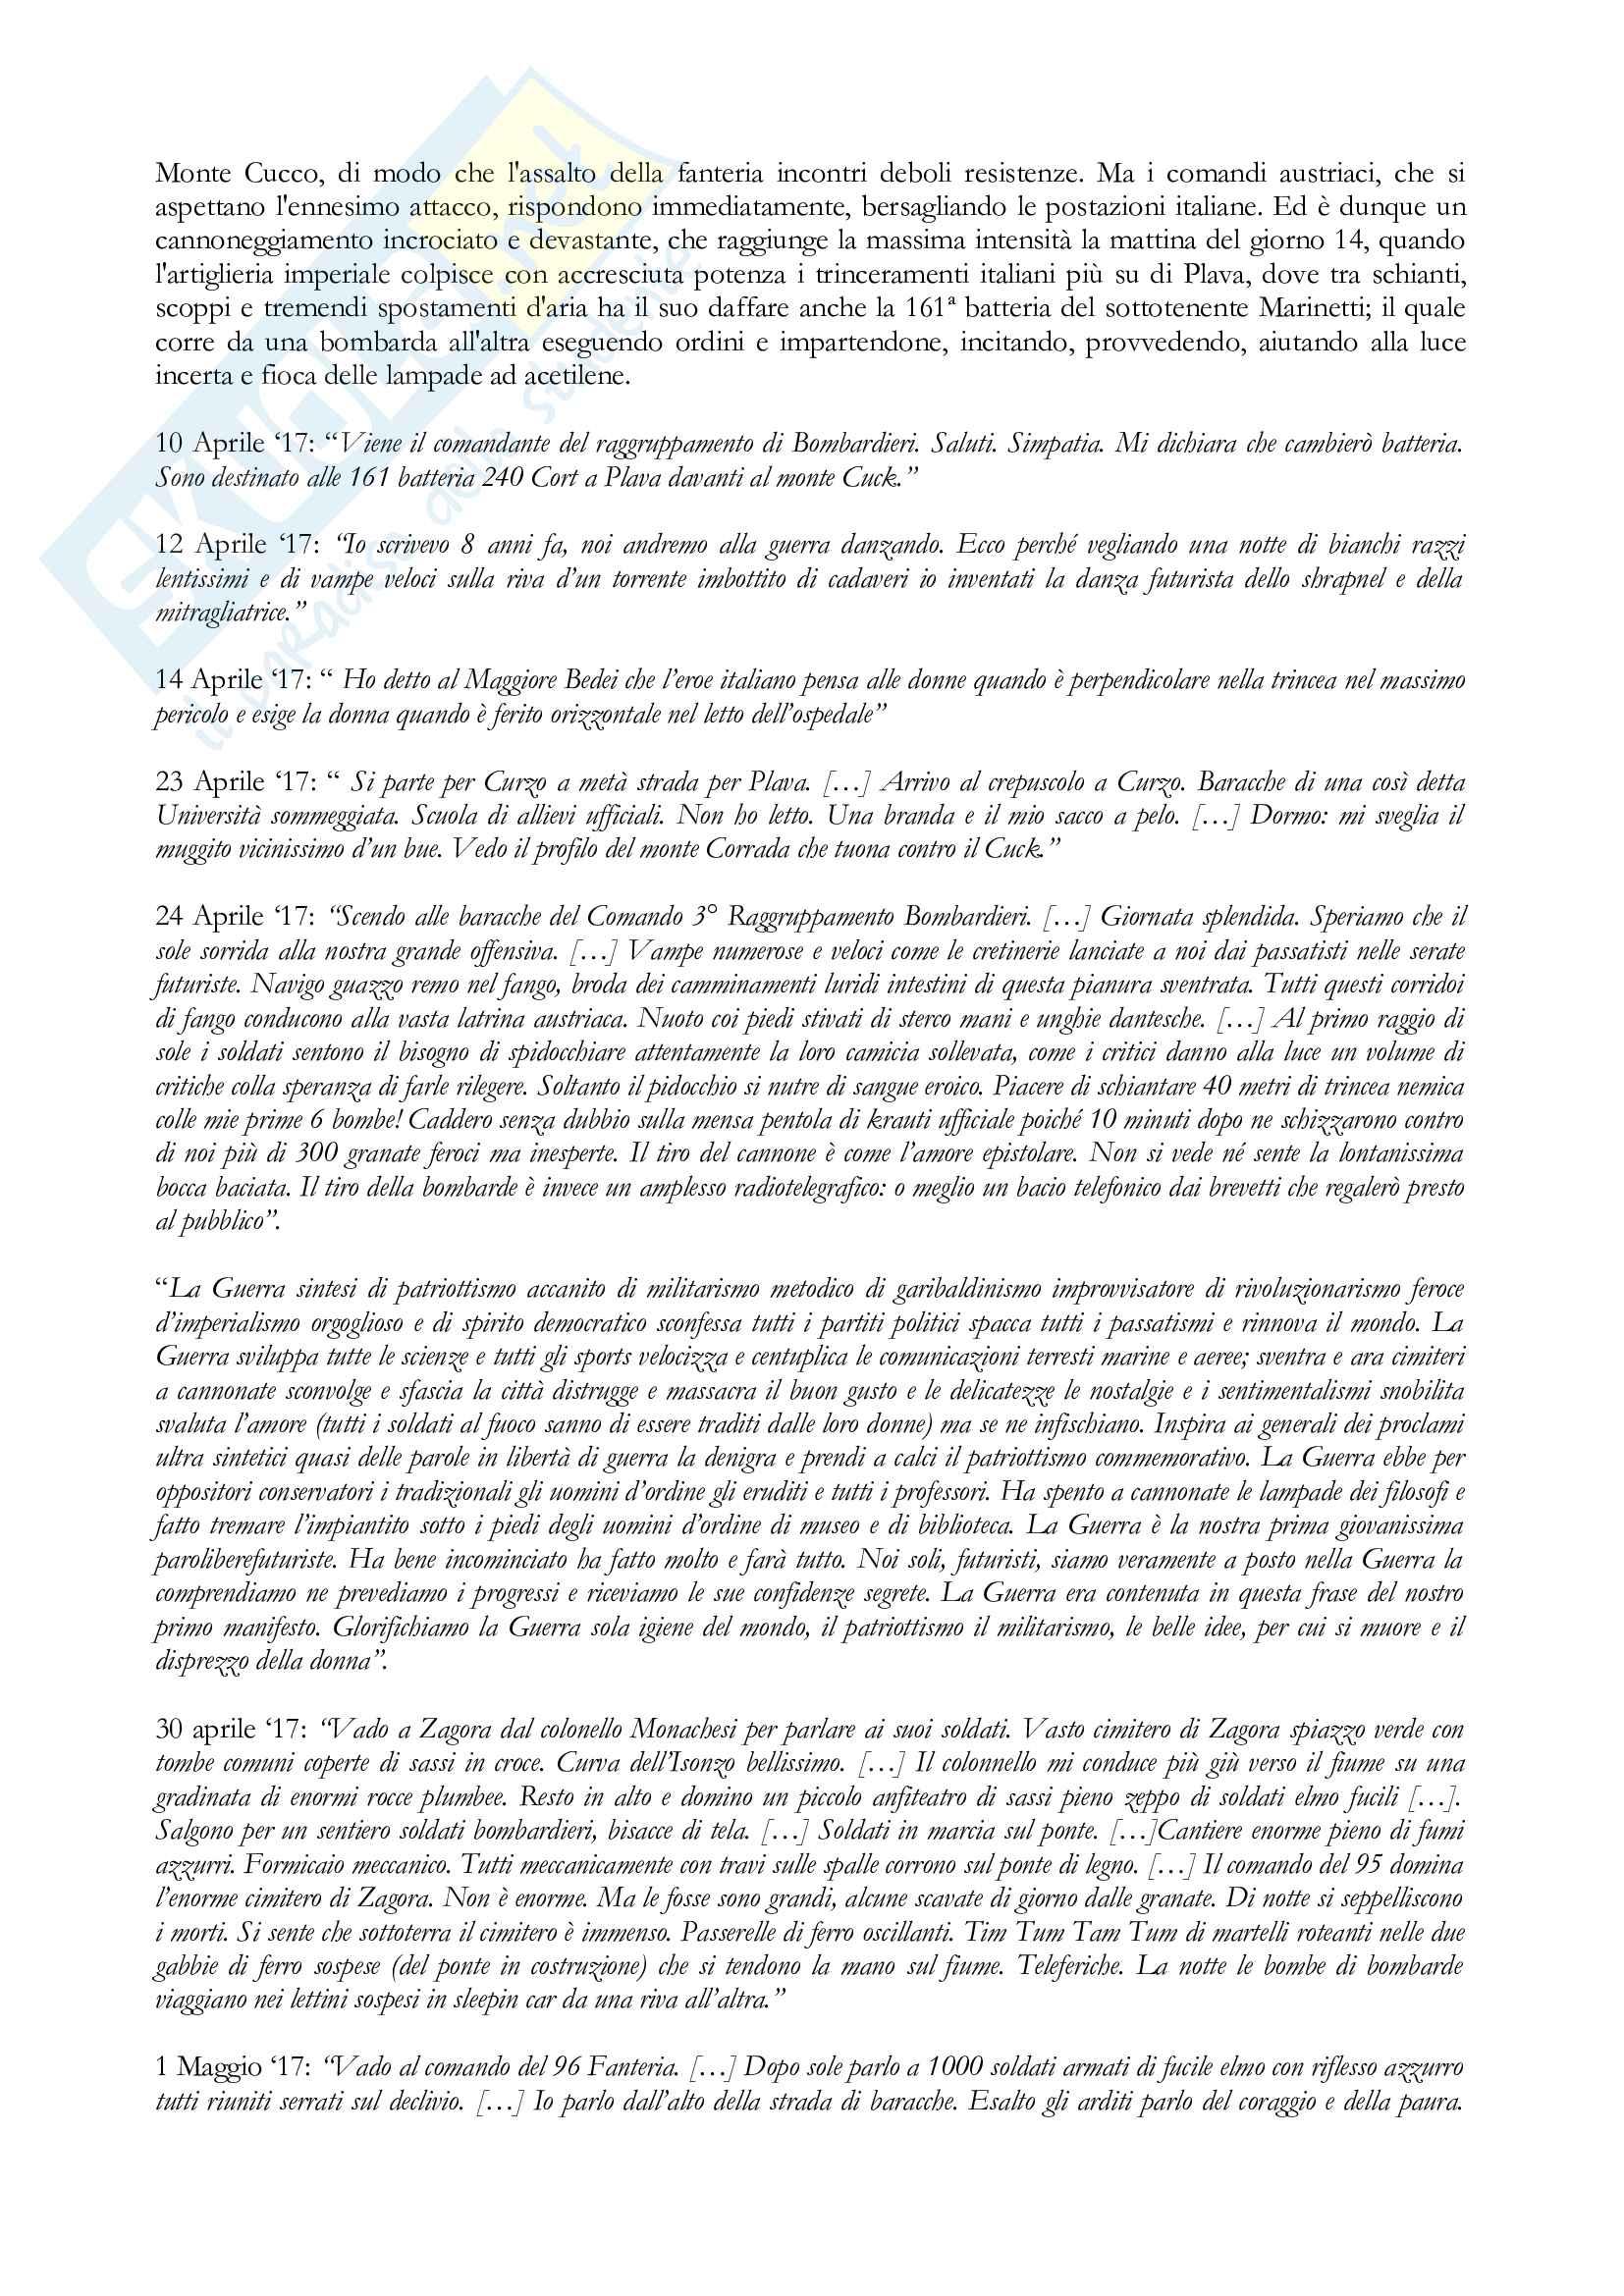 Tesi Futurismo e Filippo Tommaso Marinetti Pag. 21